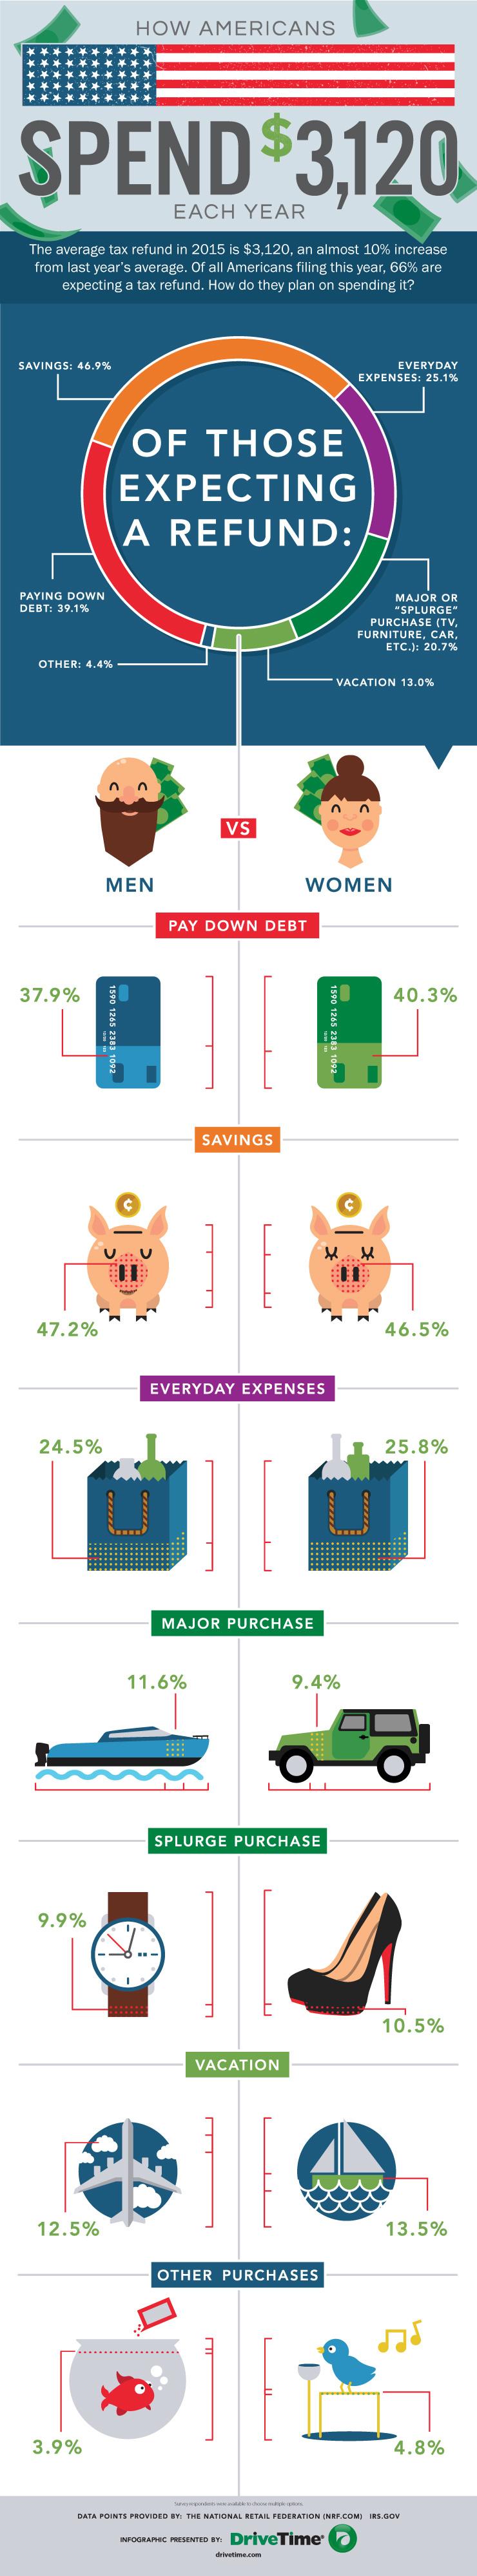 Tax Refund #Infographic | www.TheHeavyPurse.com